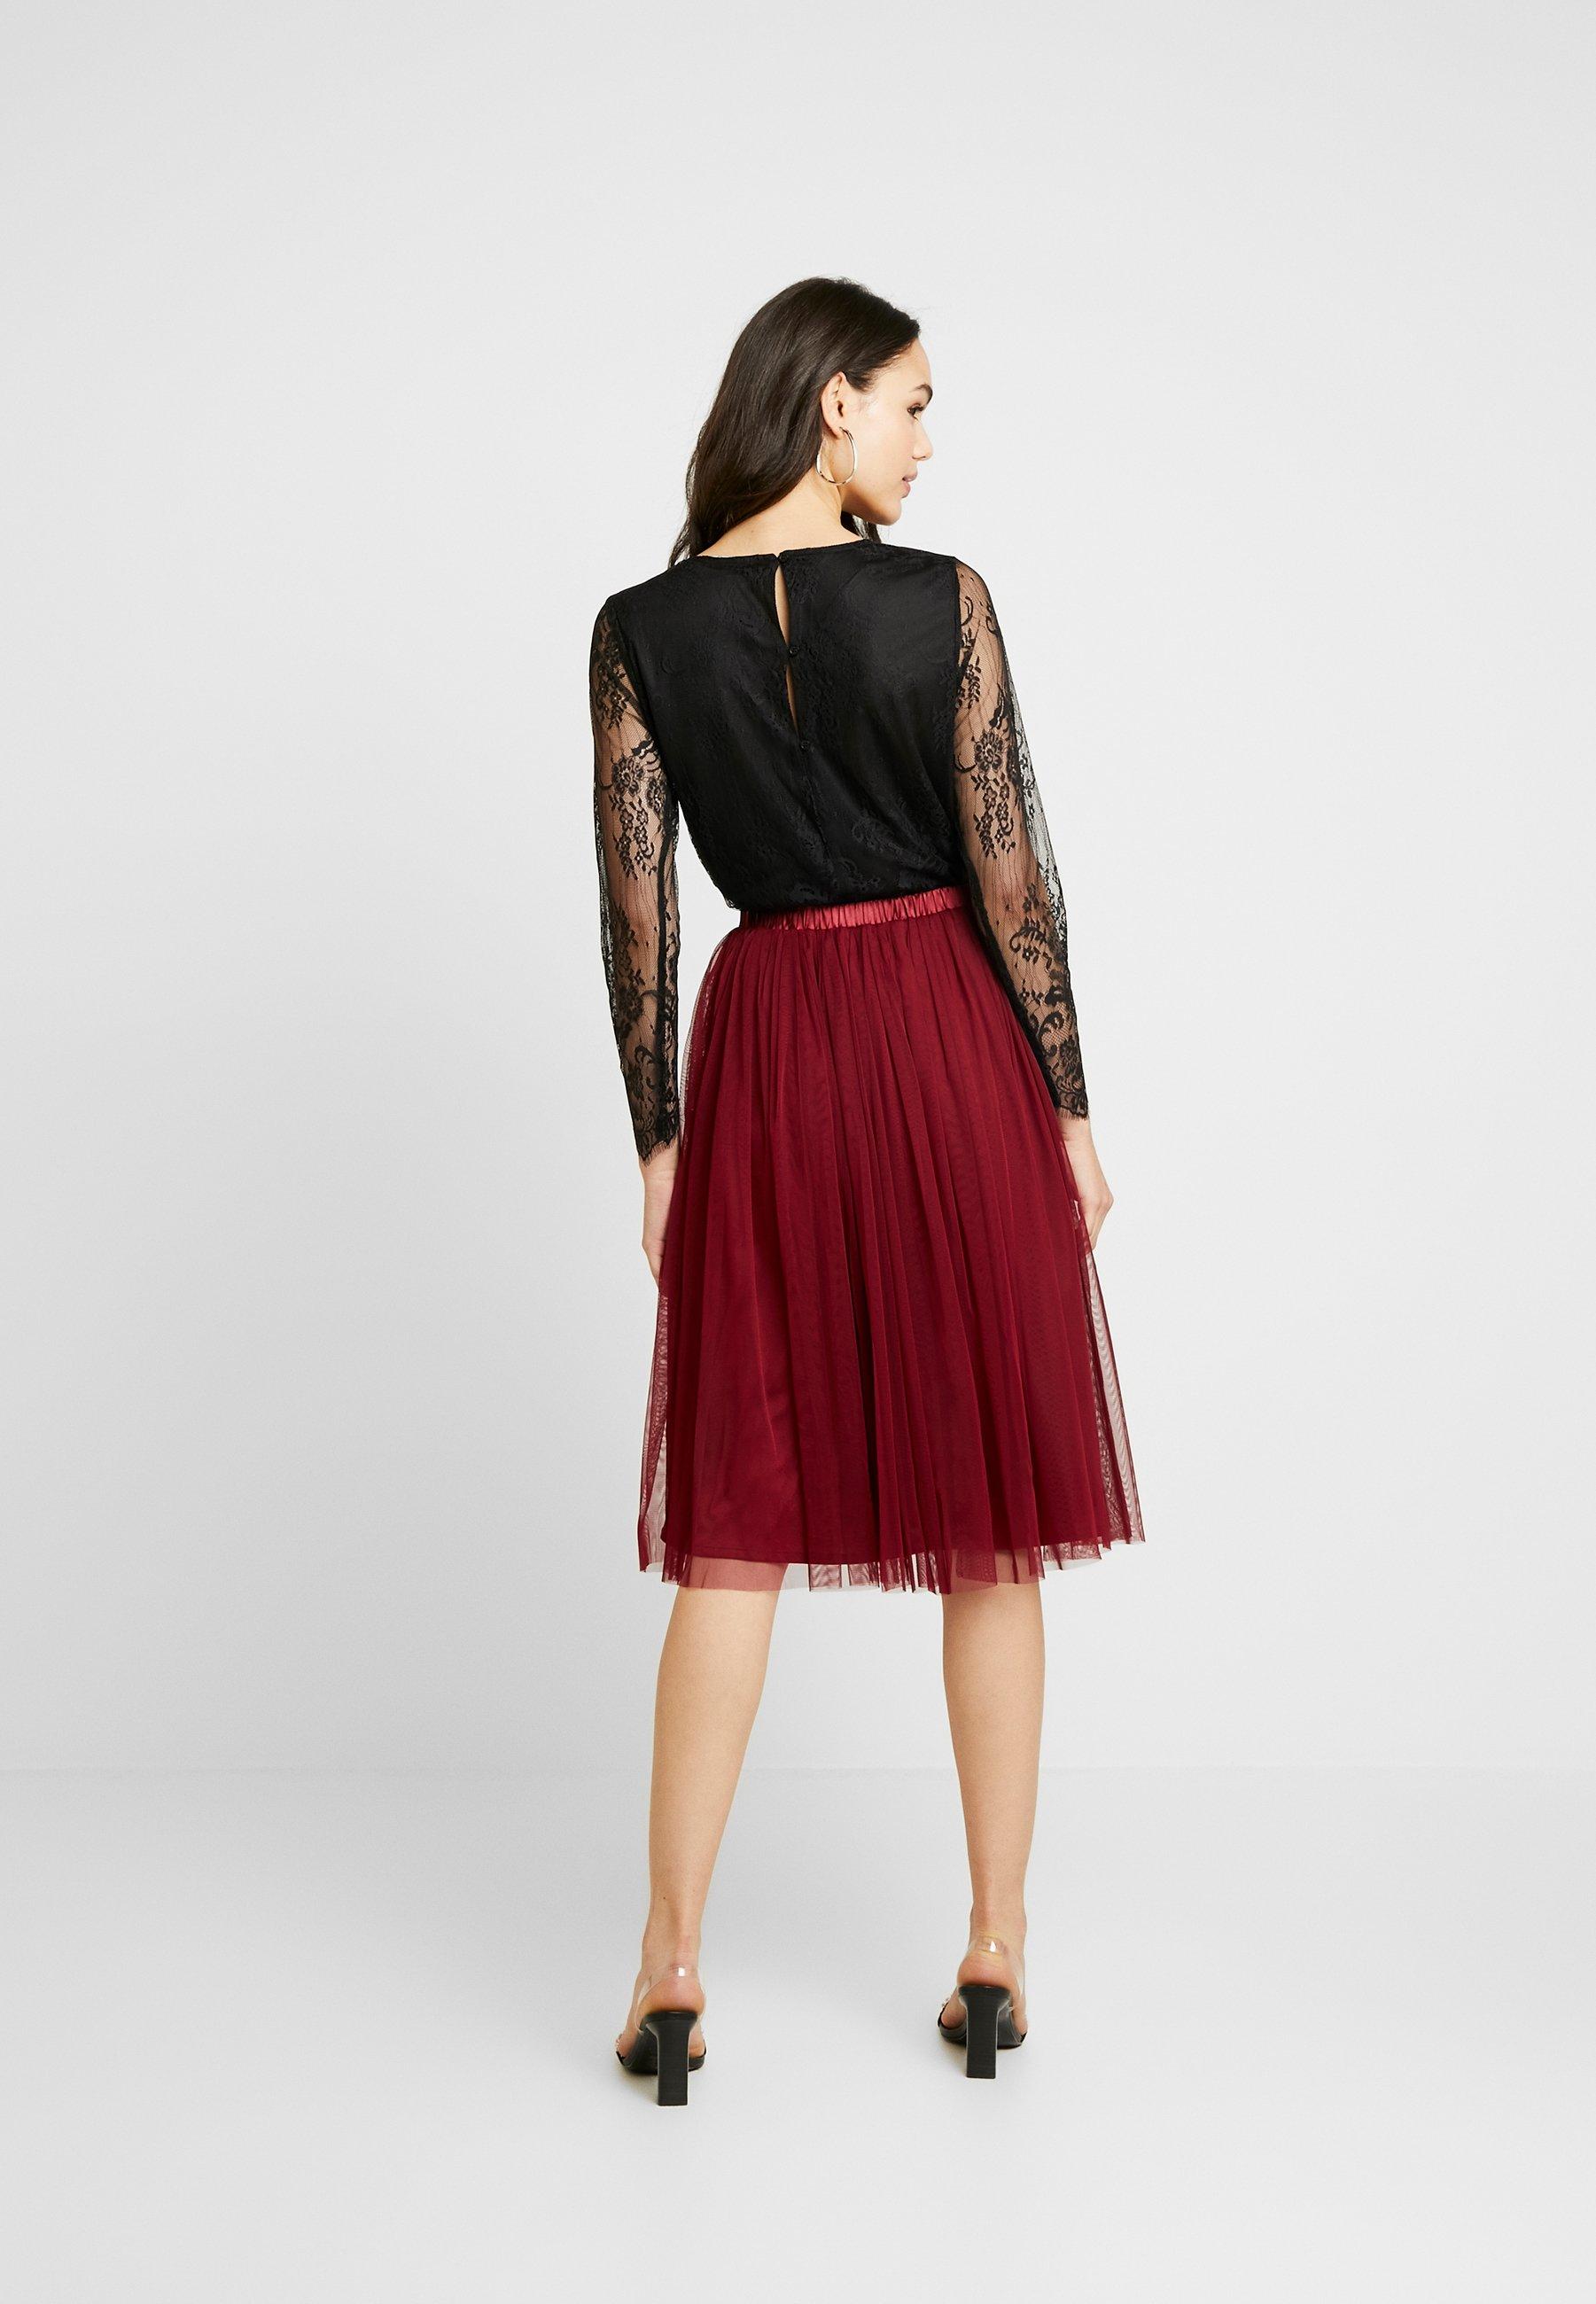 Lace & Beads VAL SKIRT - Gonna a campana burgundy